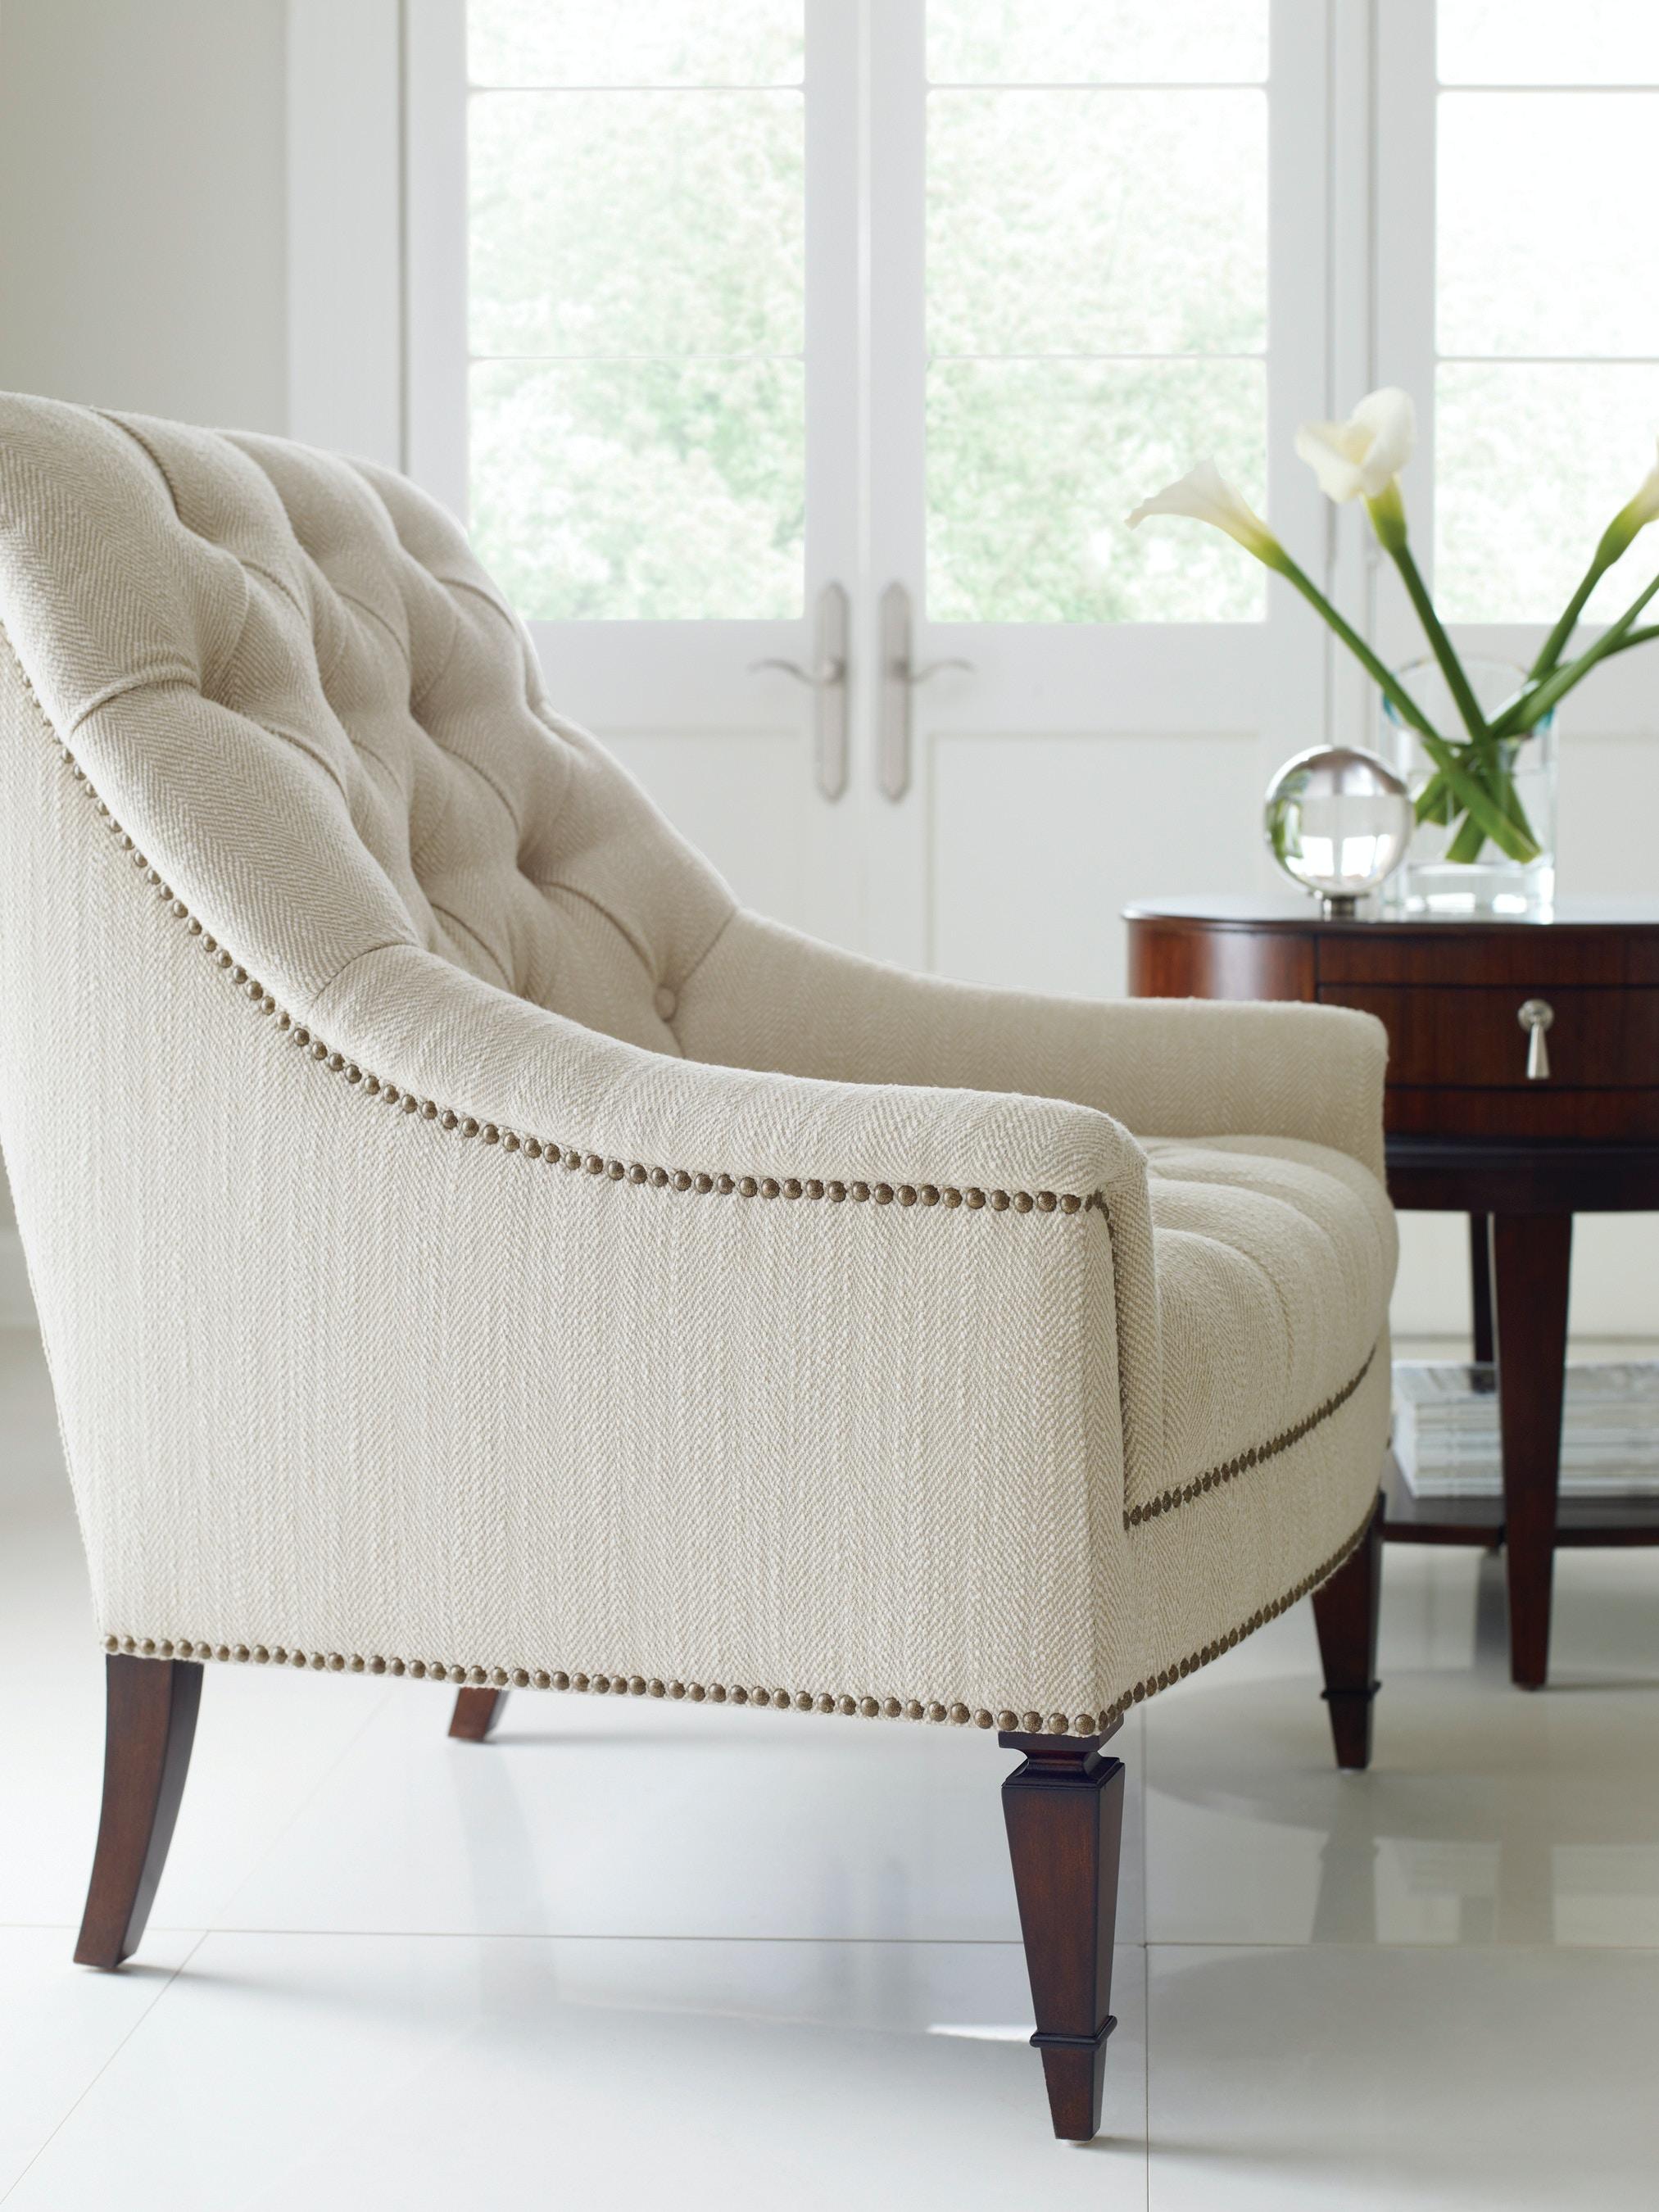 schnadig sofa 9090 sleeper chaise lounge living room chair 204 g furniture